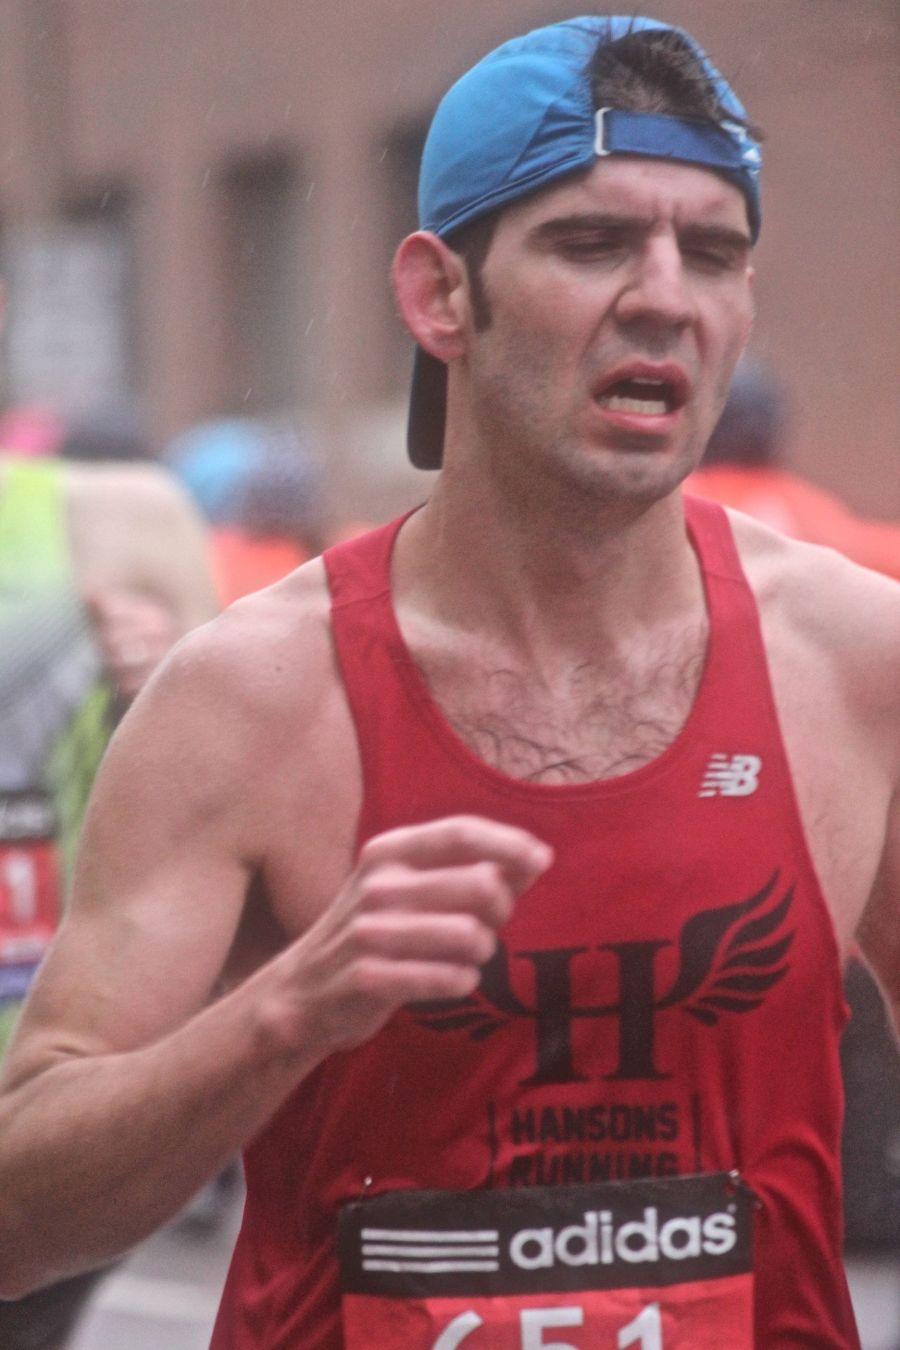 boston marathon april 20 2015 racer number 651